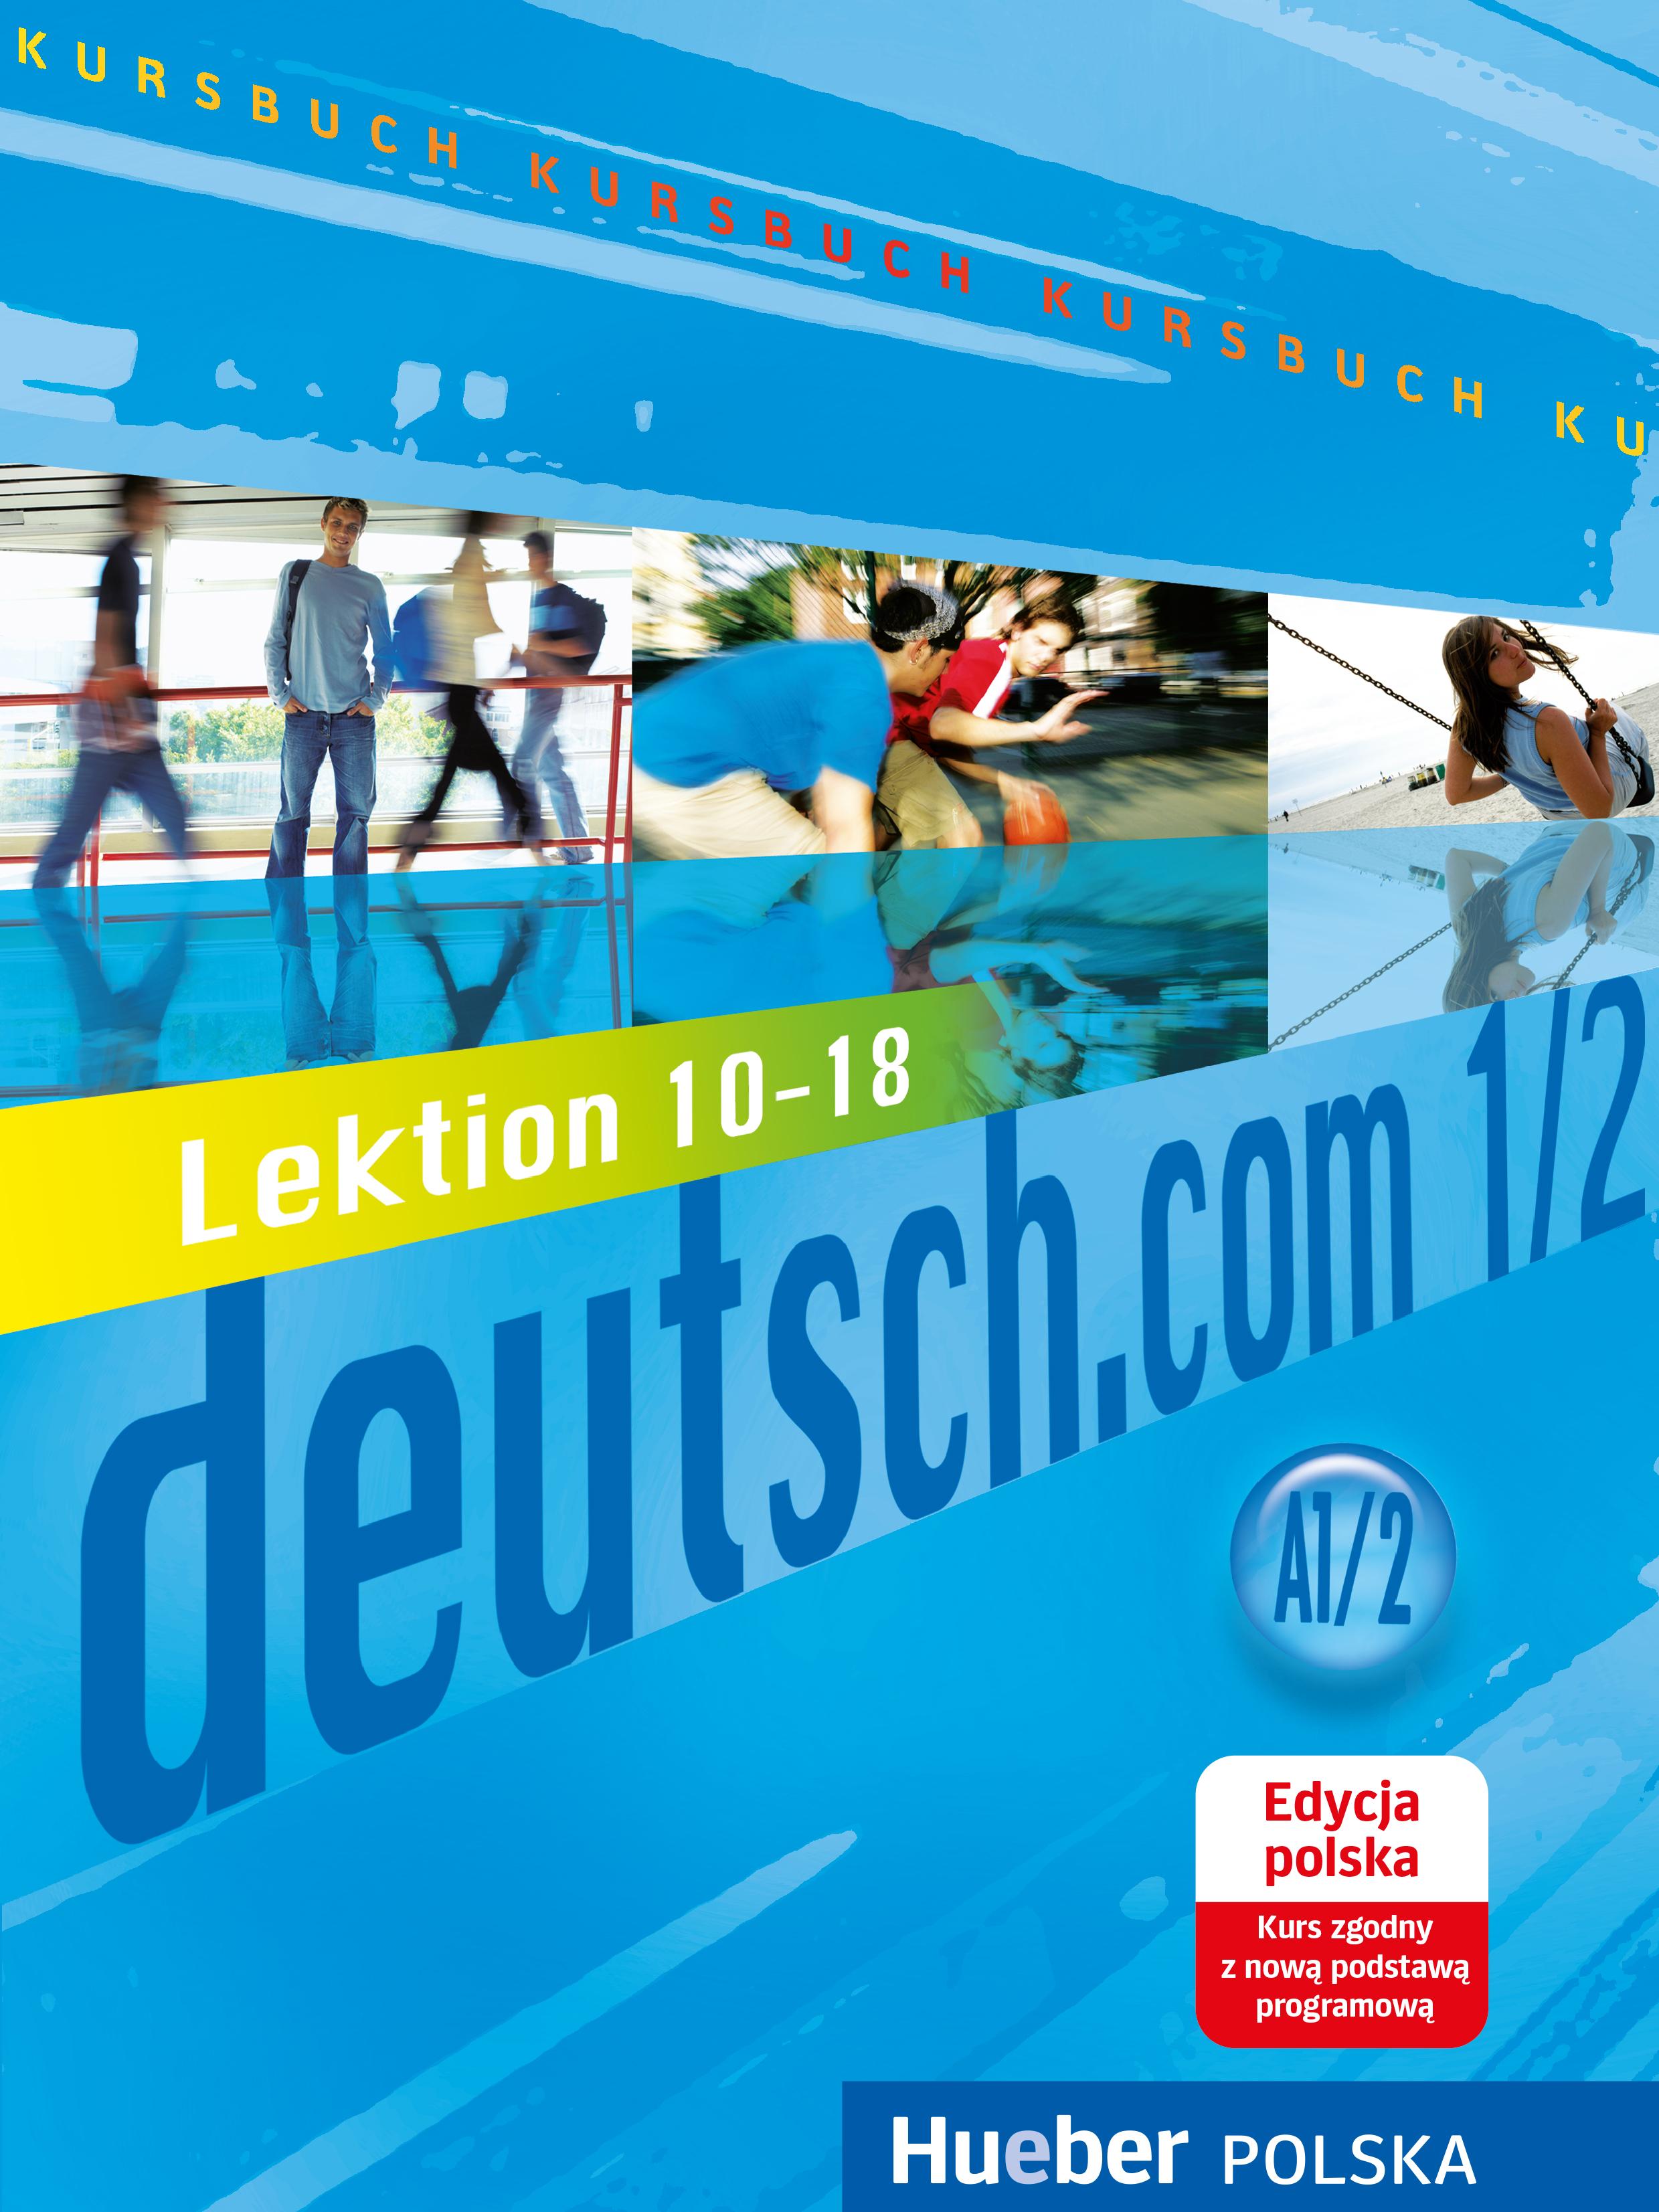 deutsch.com 1/2 Edycja polska